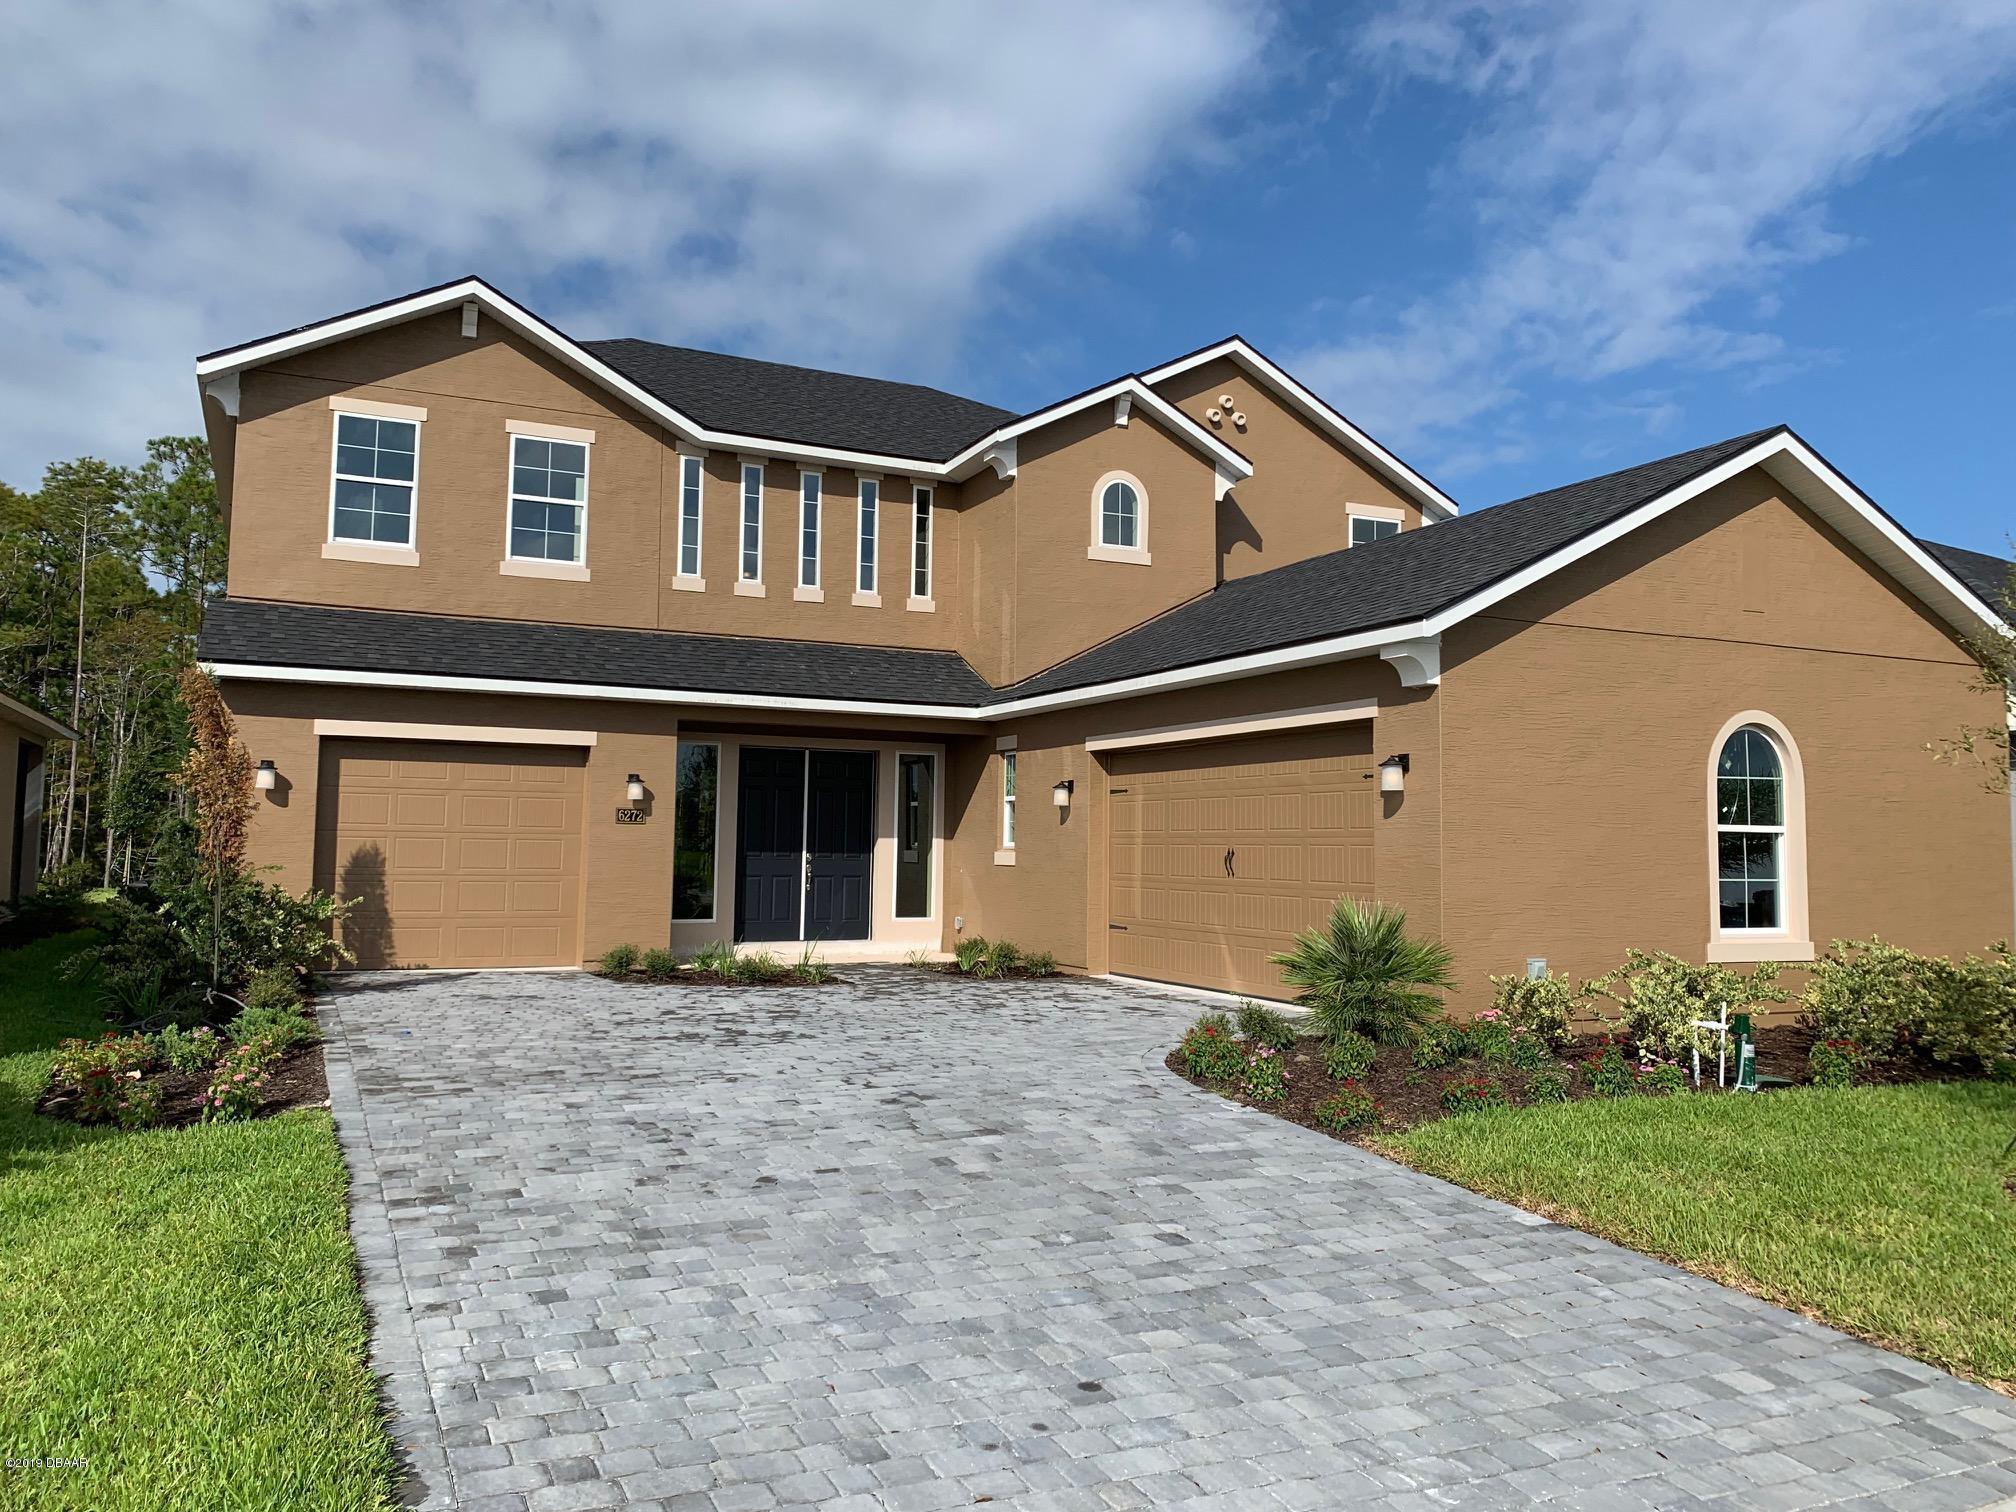 Photo of 6272 W. Fallsgrove Lane, Port Orange, FL 32128